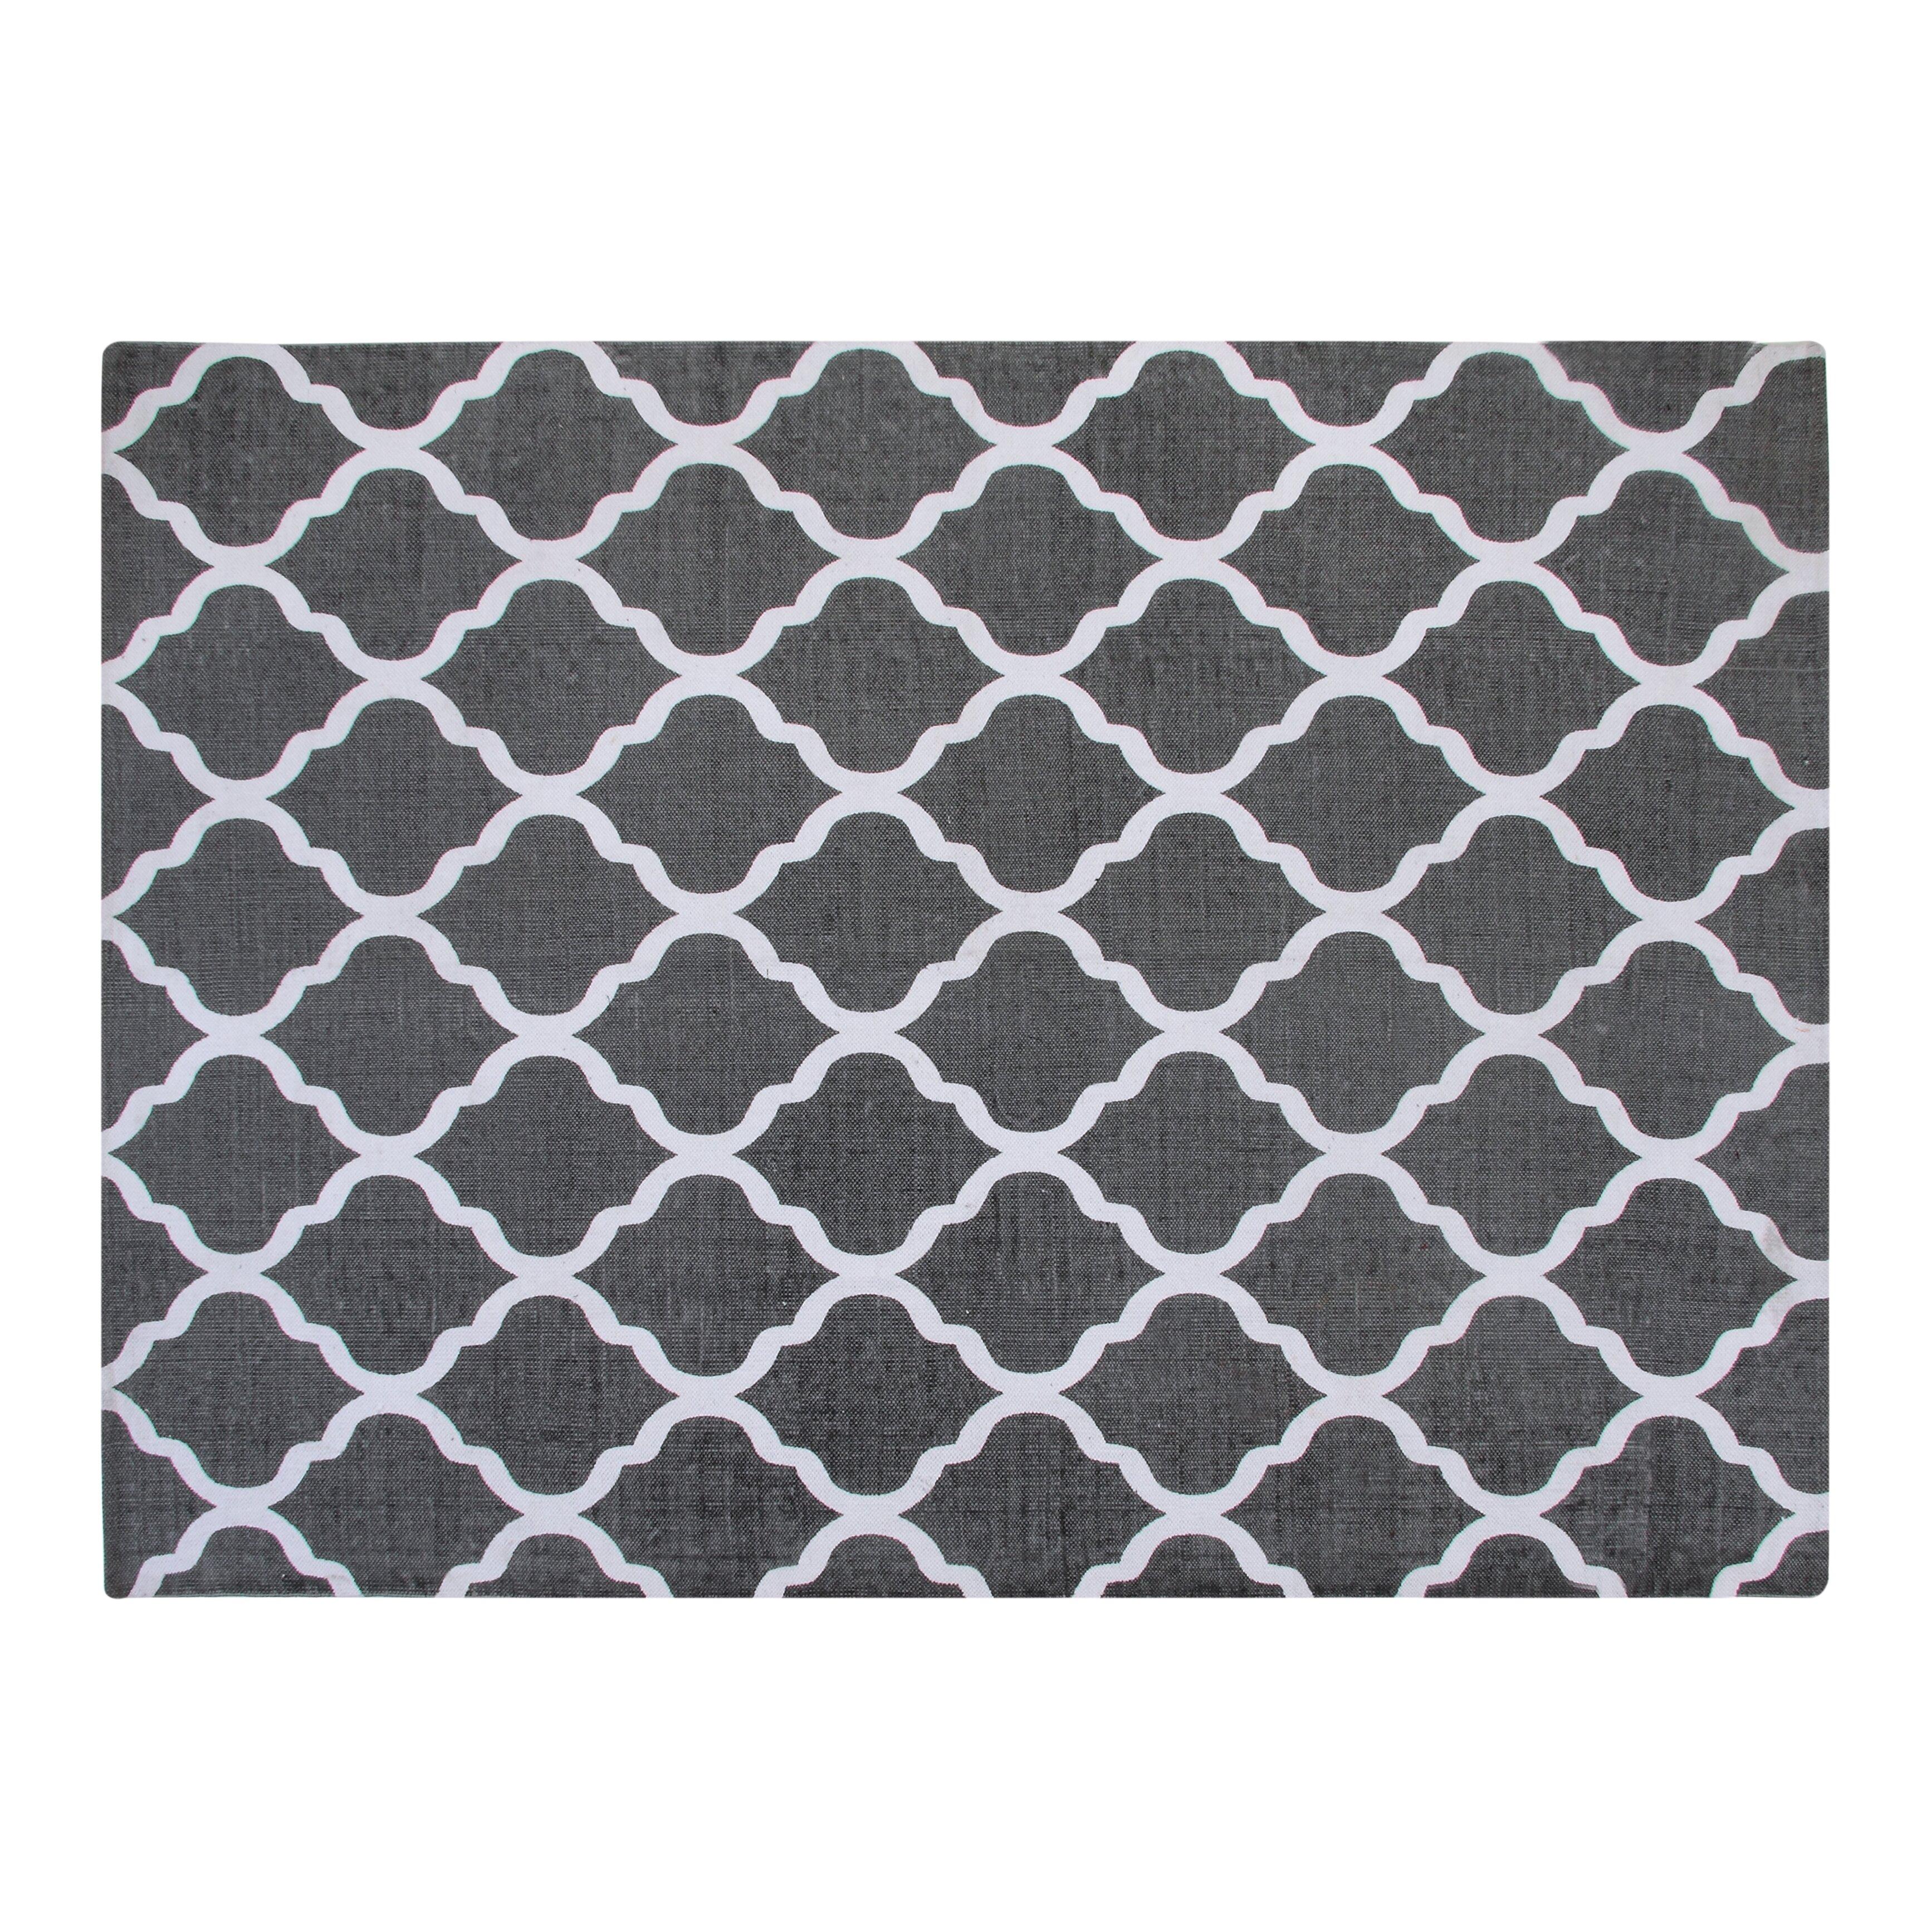 Chesapeake Cotton Printed Grey and White Quatrefoil Geometric Rug u0026 Reviews : Wayfair